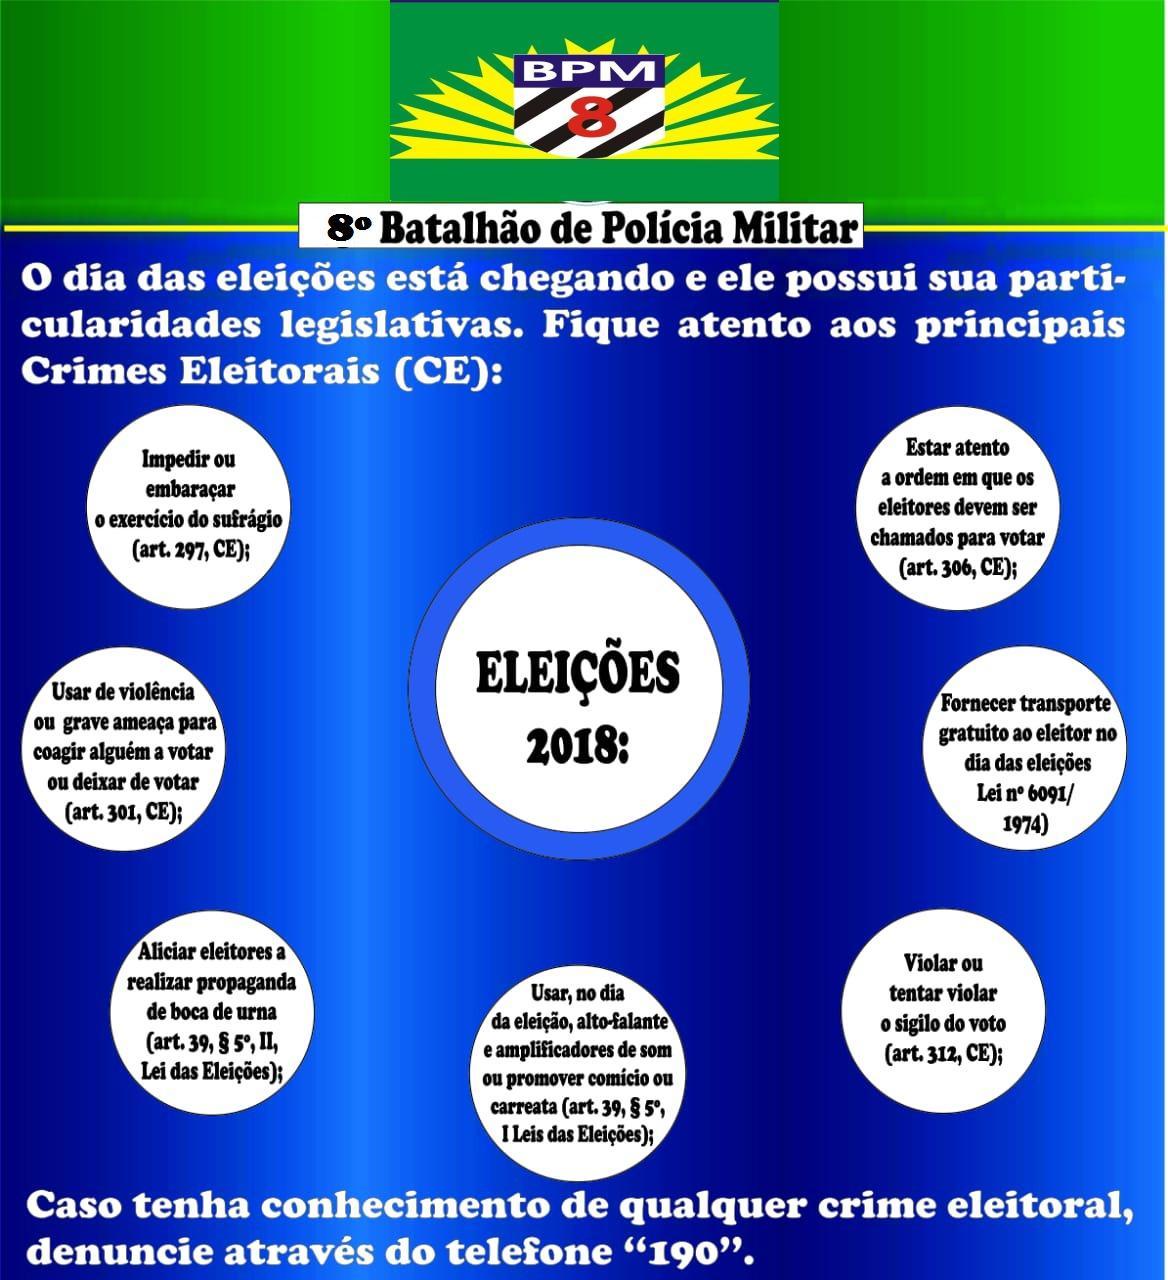 Fique atento aos principais Crimes Eleitorais